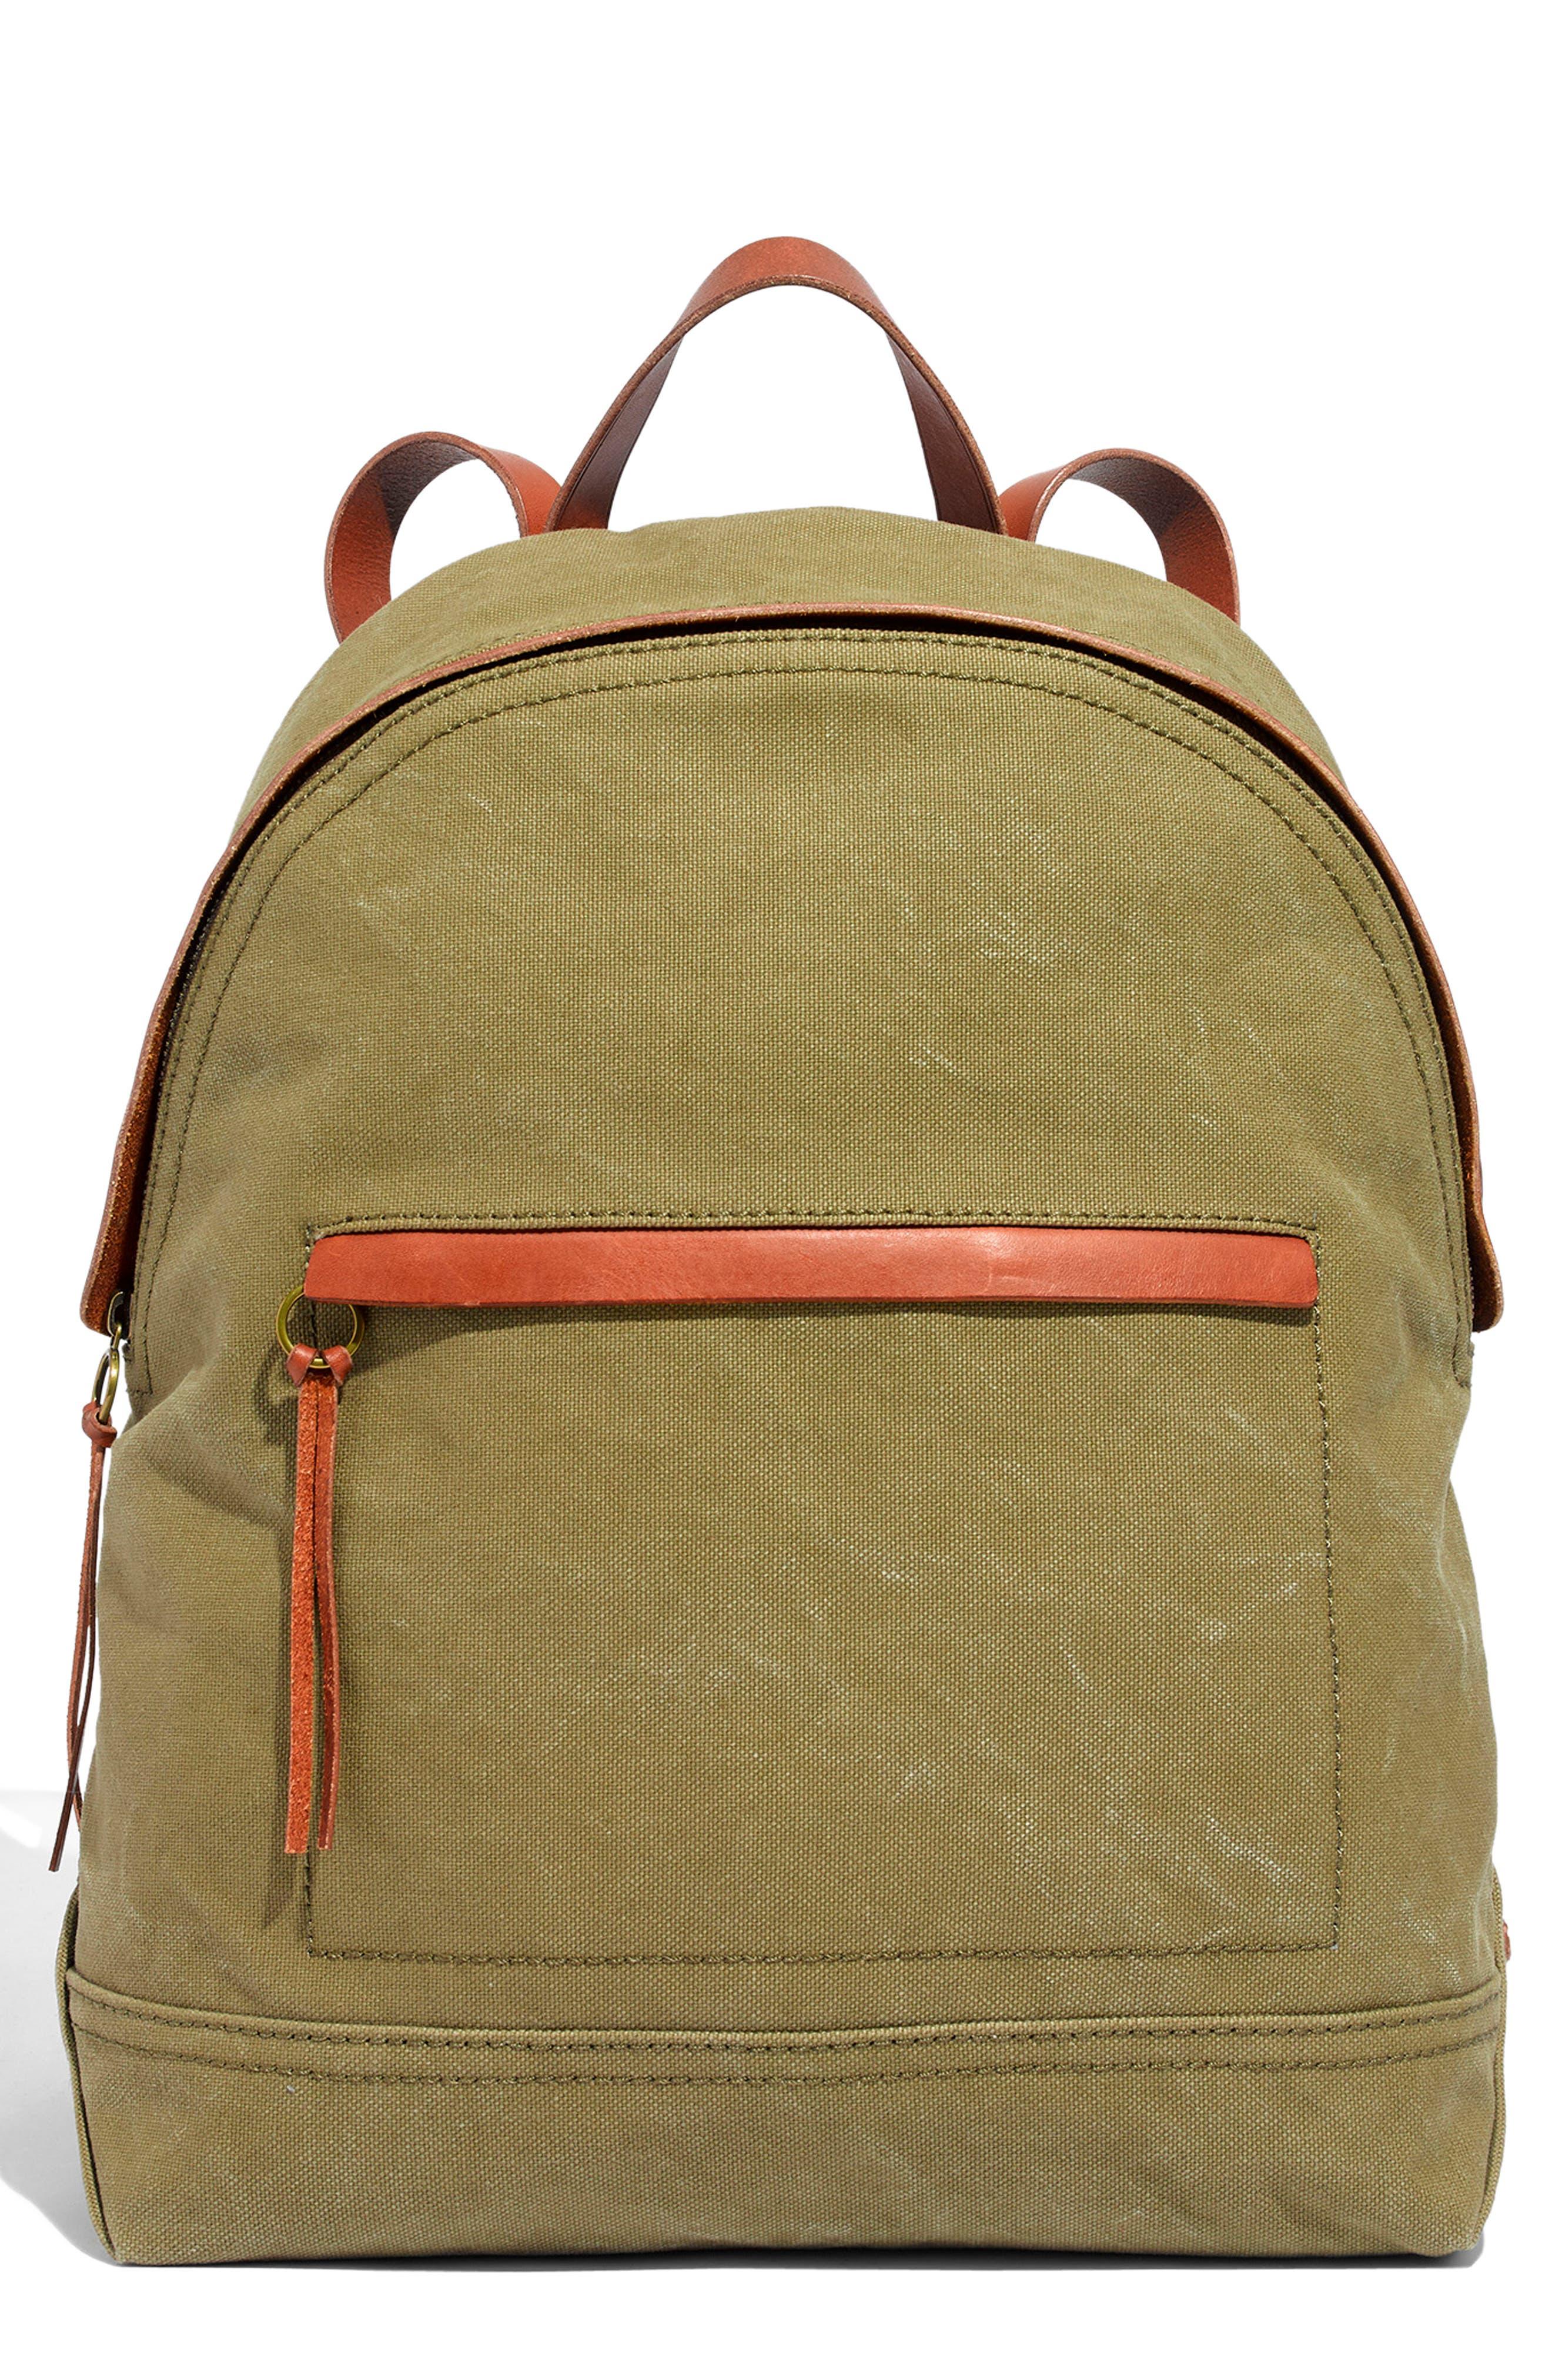 The Charleston Backpack - Green in British Surplus